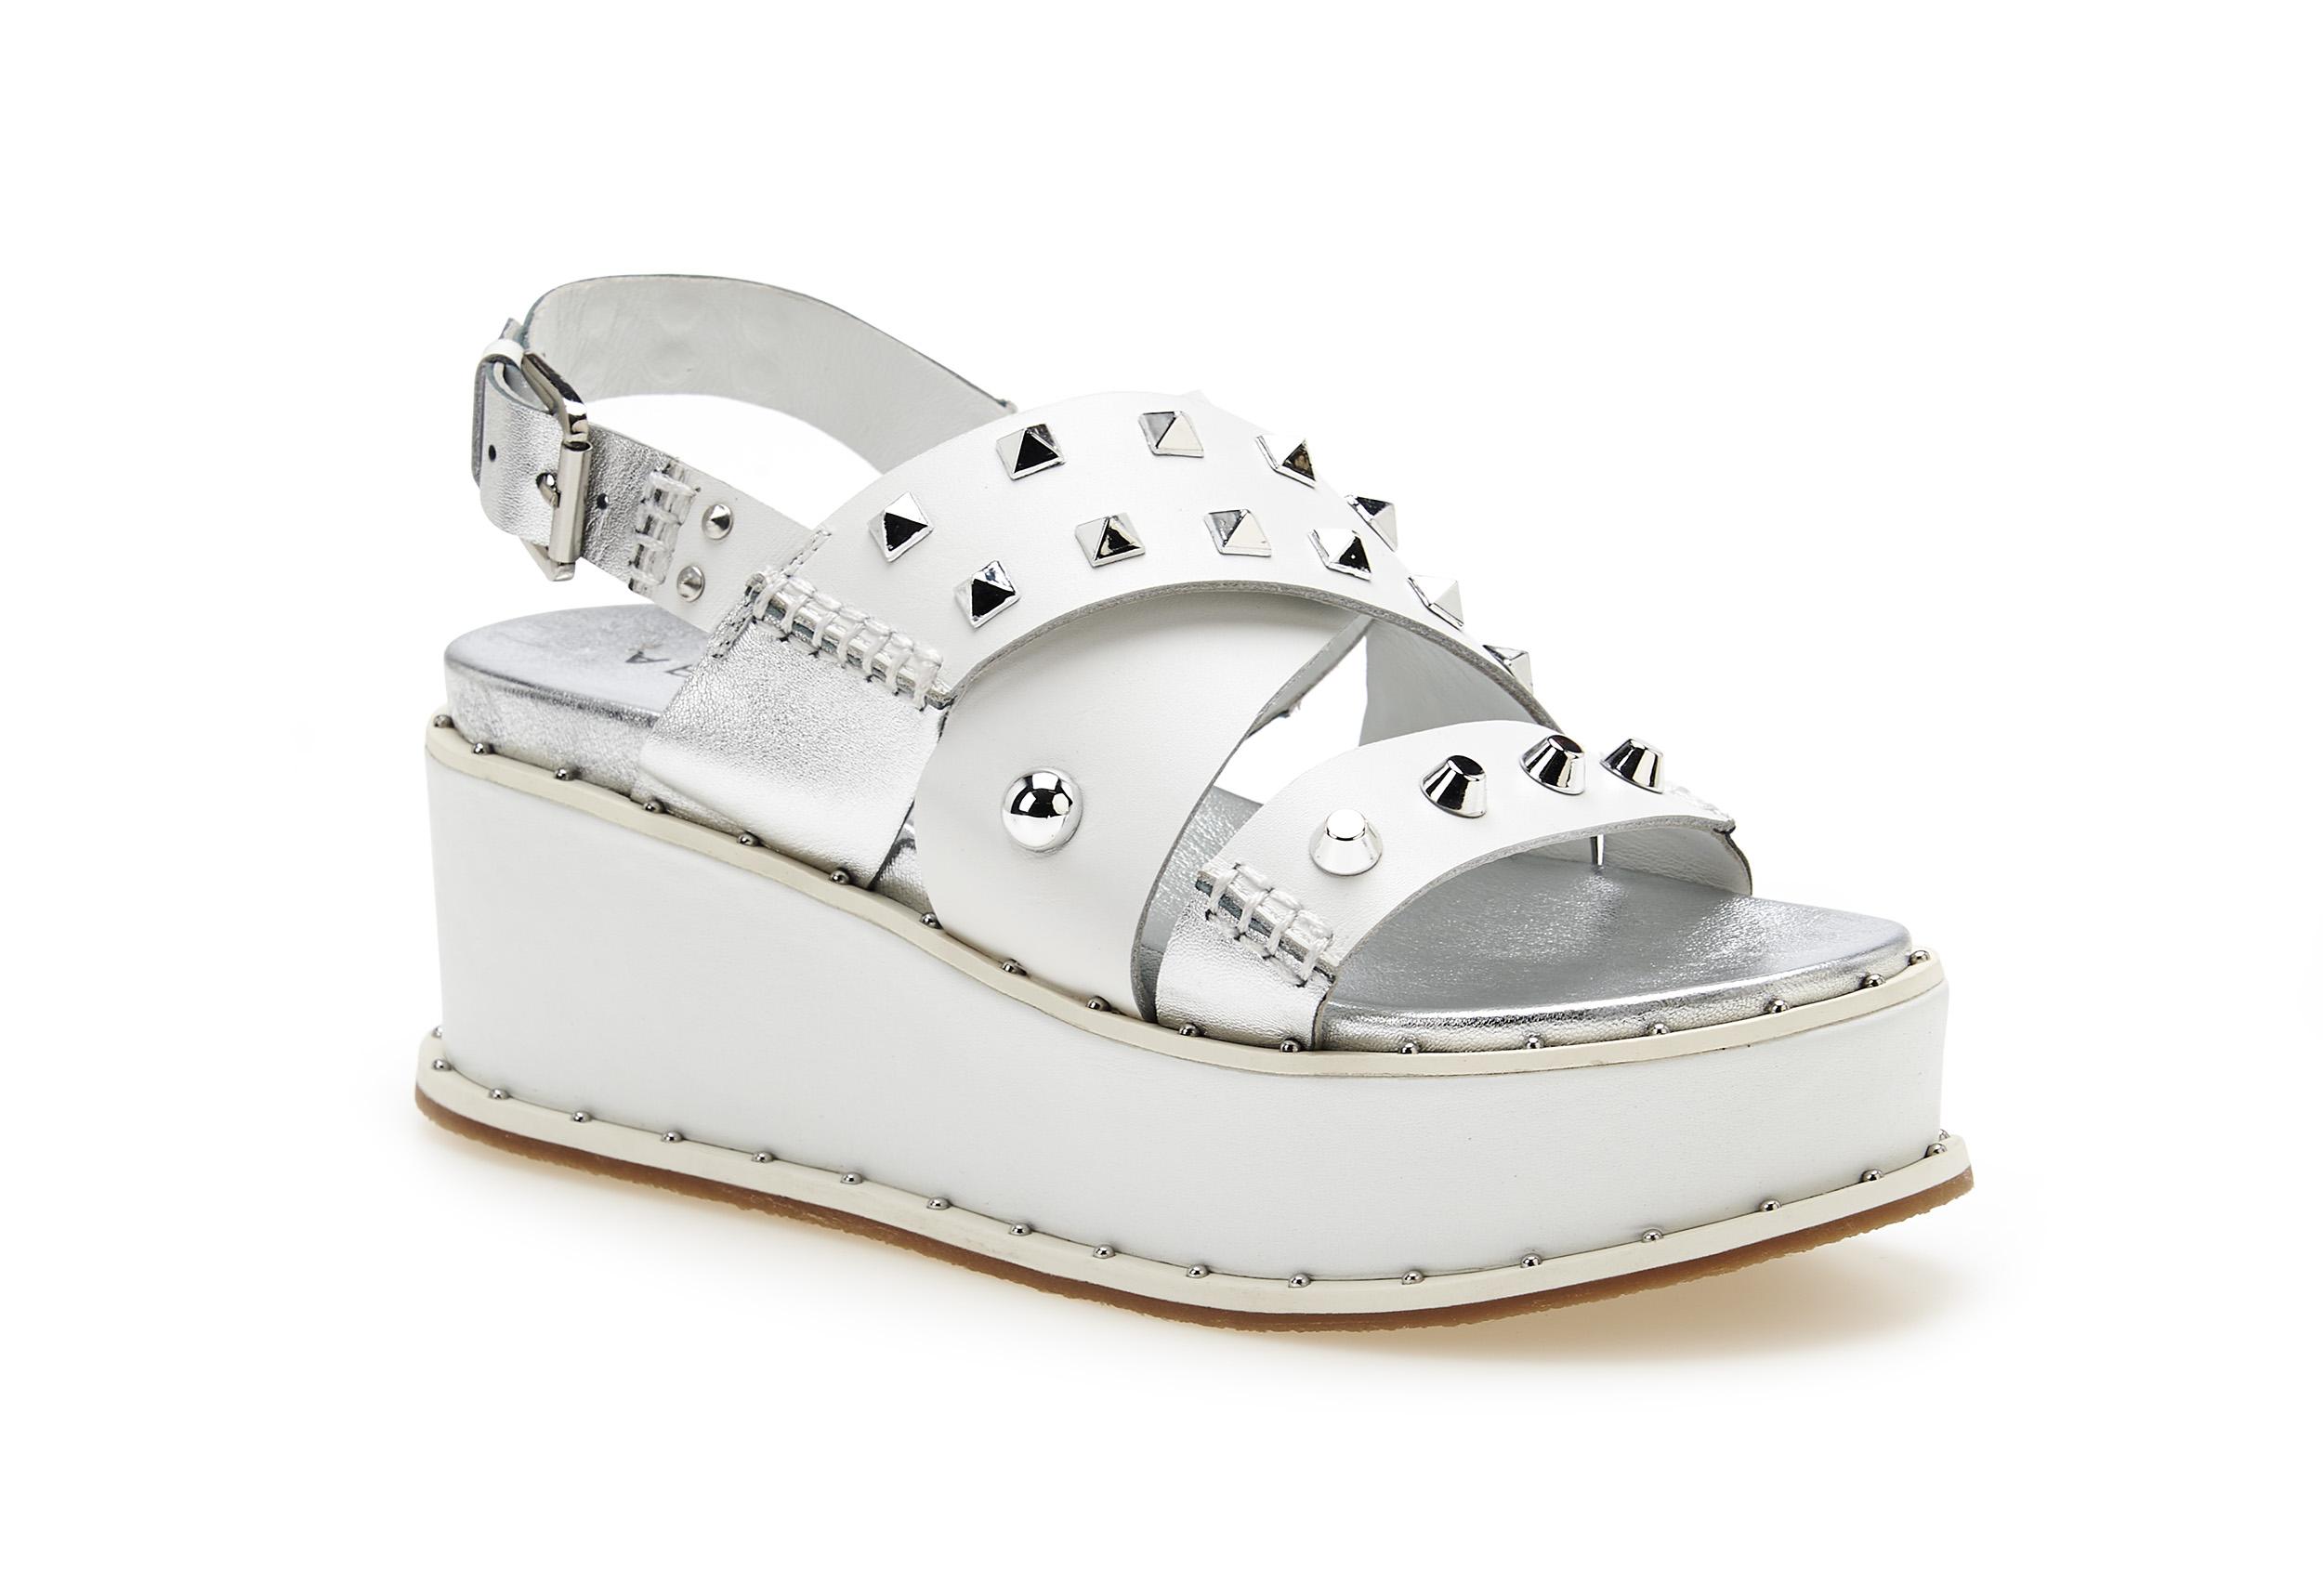 ragazze scarpe 1